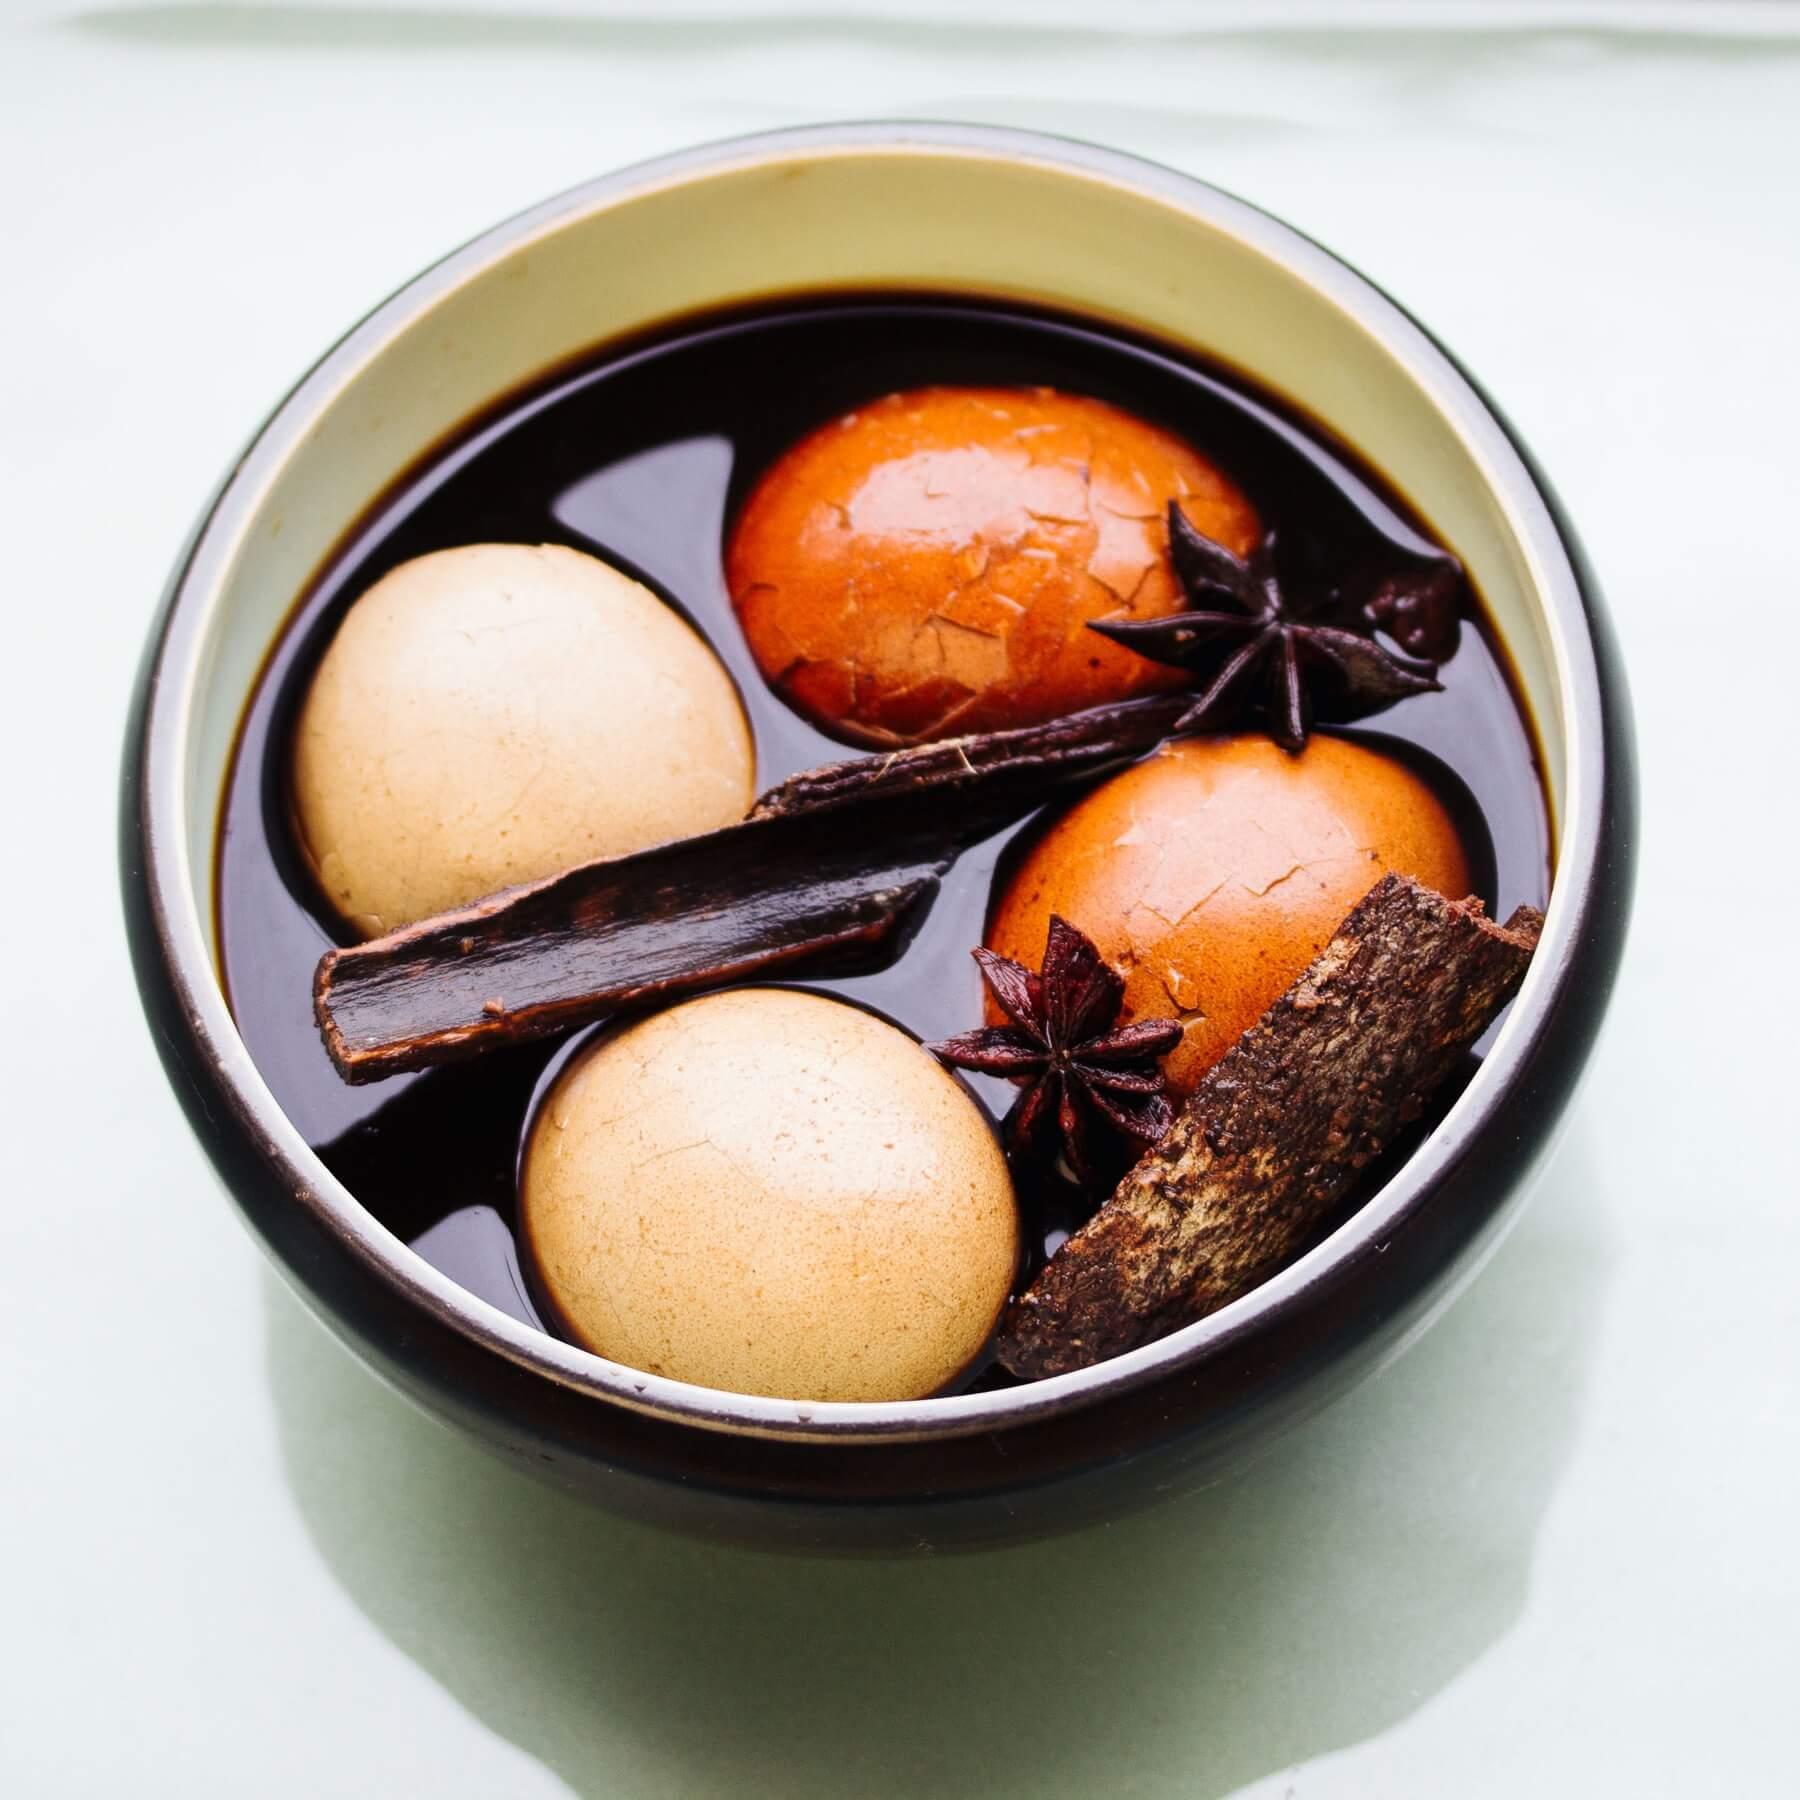 Chinesische Tee Eier